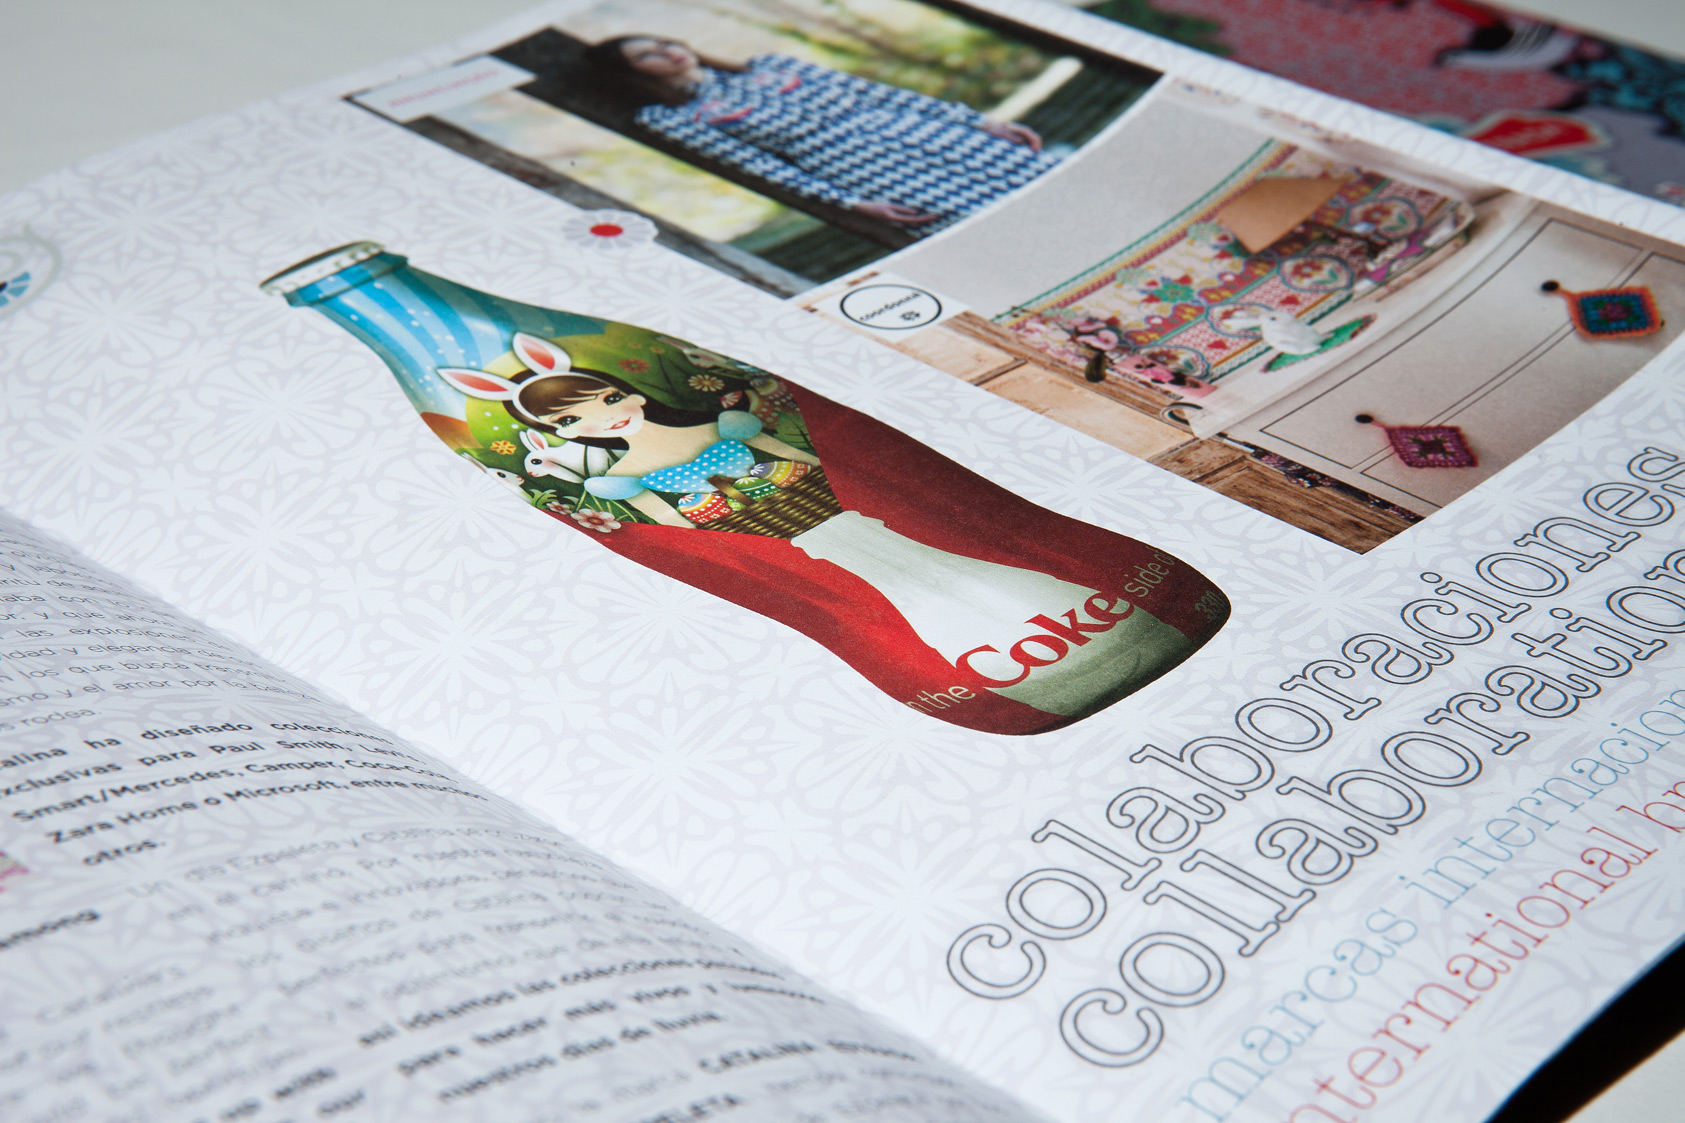 lombok_design_marketing_blog_ezpeleta_catalogos_3